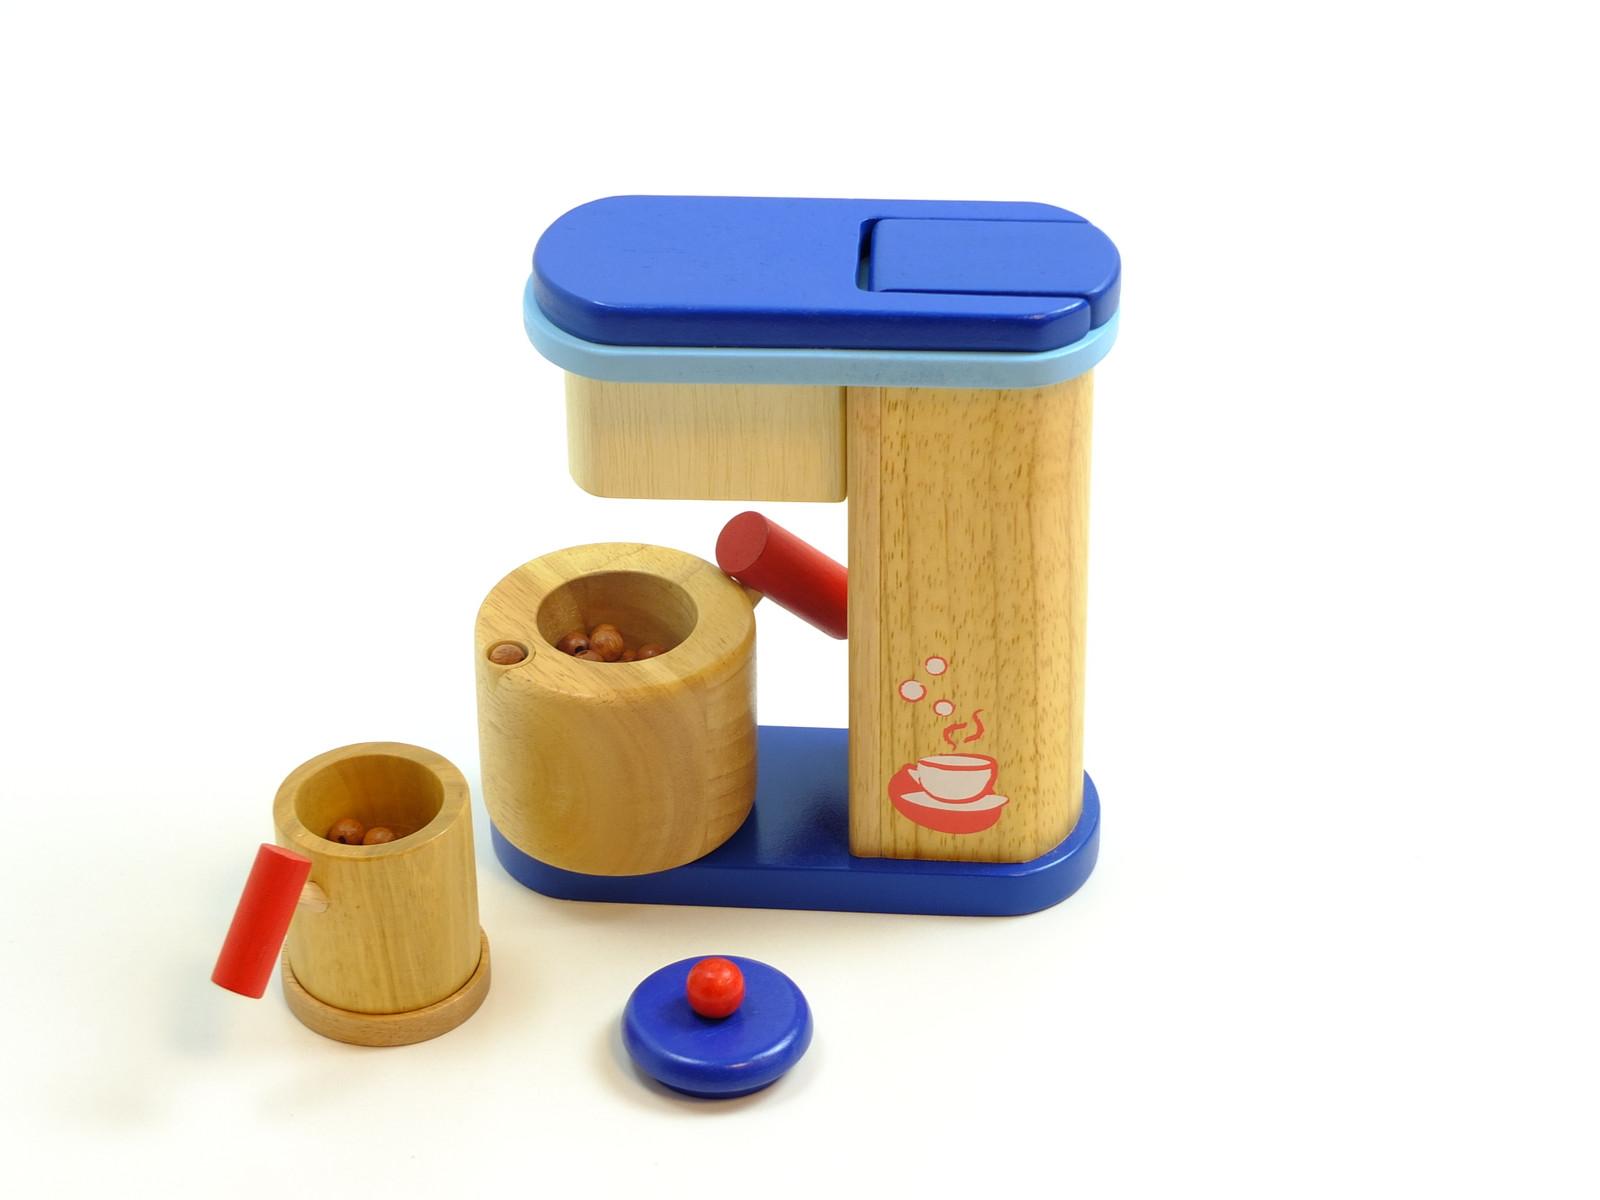 kaffeemaschine mit kanne tasse bohnen material holz farbe holzfarbend rot blau. Black Bedroom Furniture Sets. Home Design Ideas